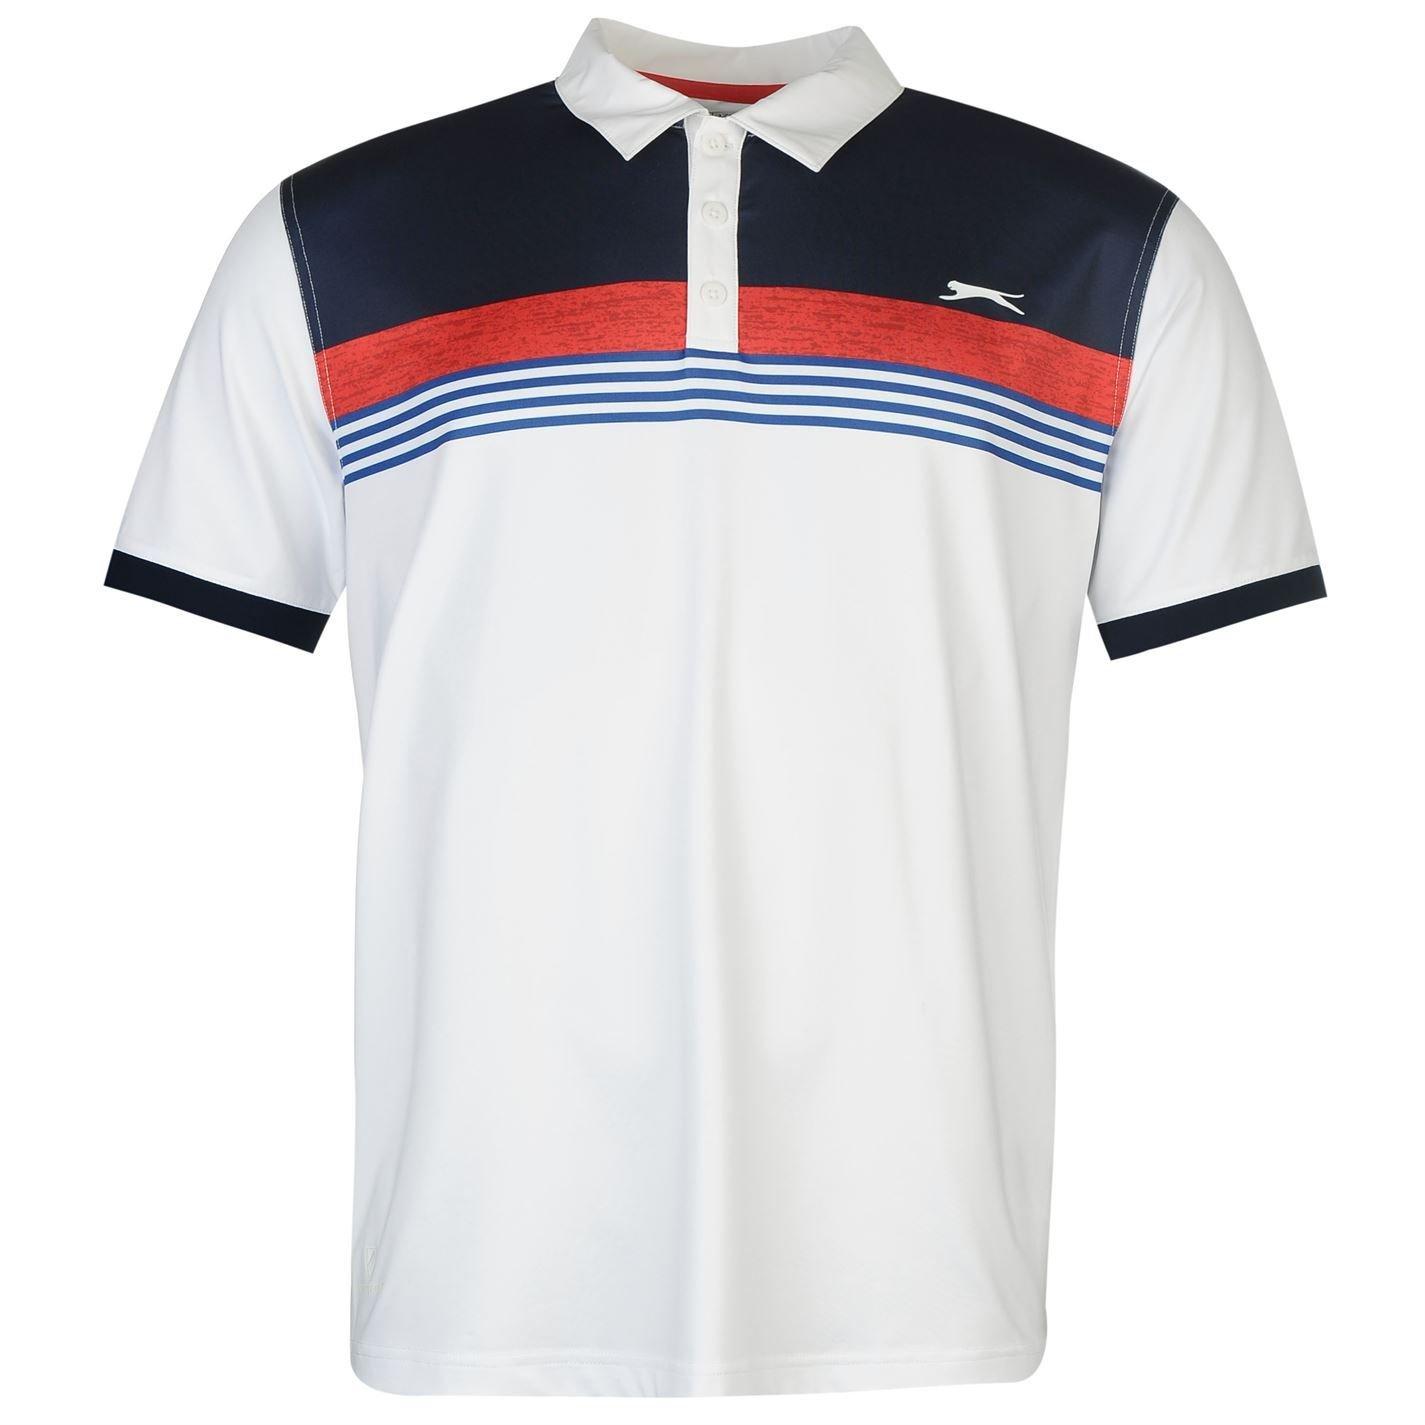 Slazenger Hombre Estampa Polo Camisa Camiseta Deporte Entrenar Top ...